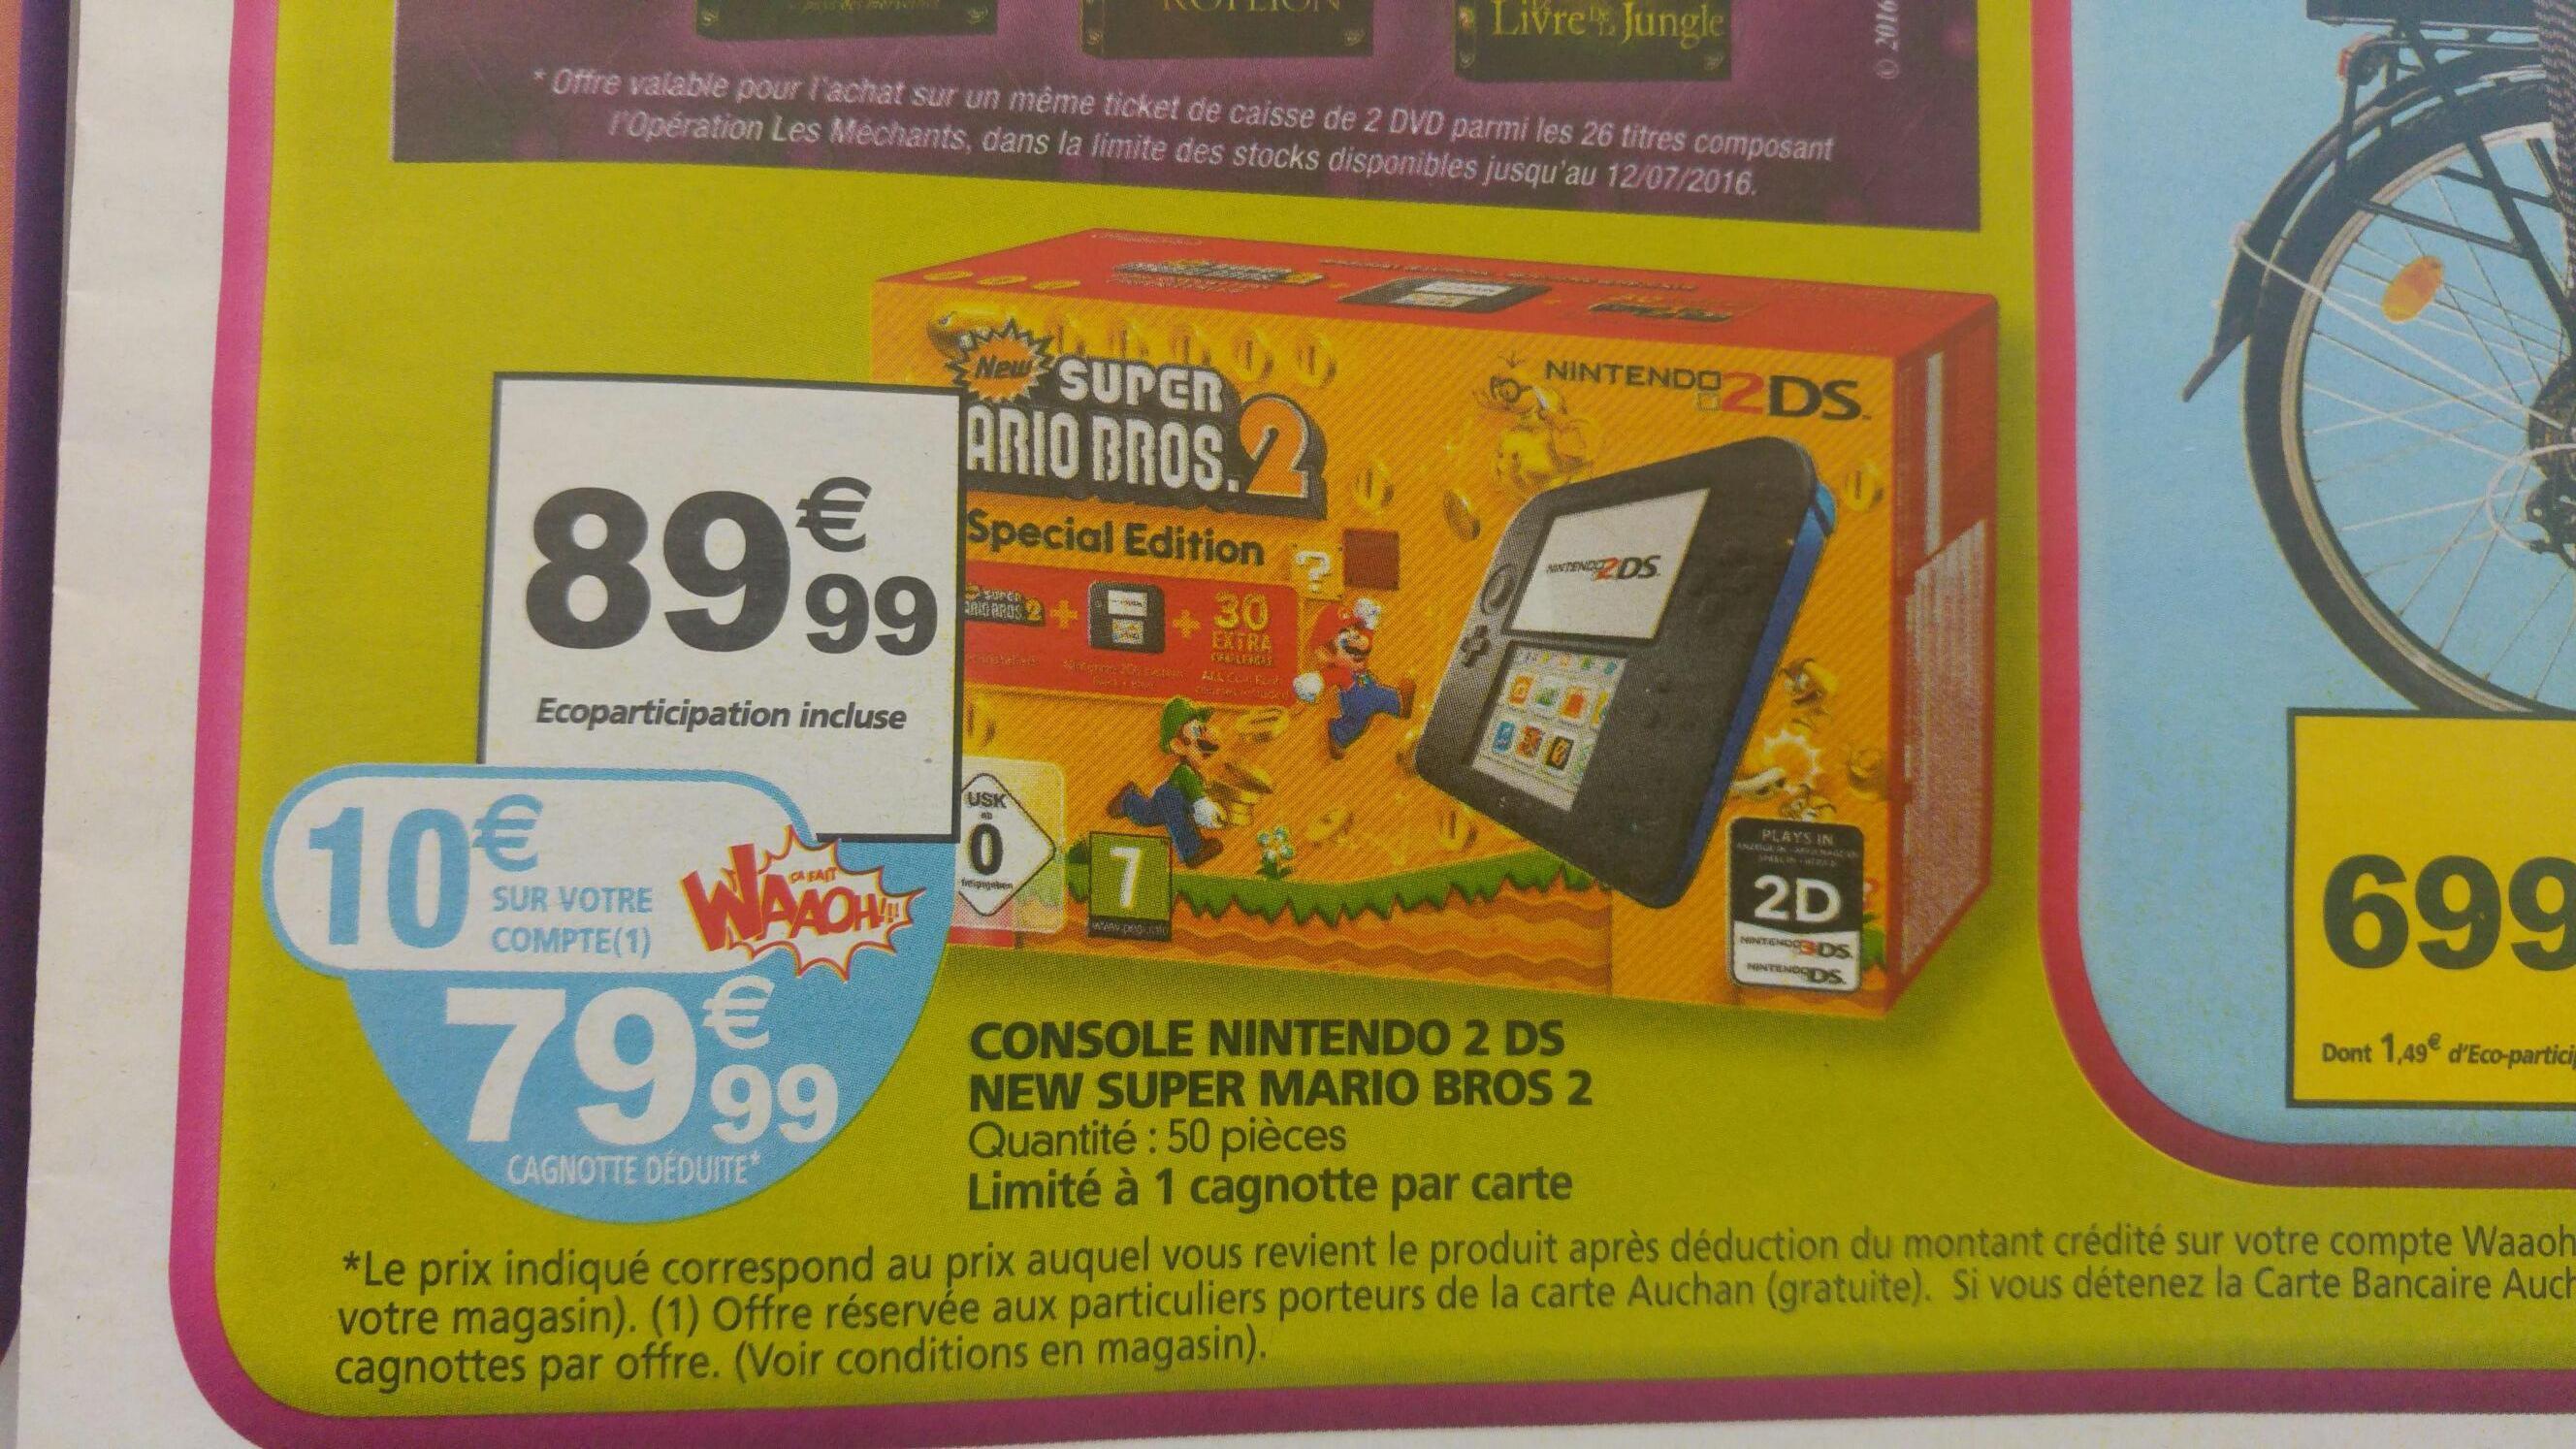 Console Nintendo 2DS + Super Mario Bros 2 (avec 10€ sur la carte)